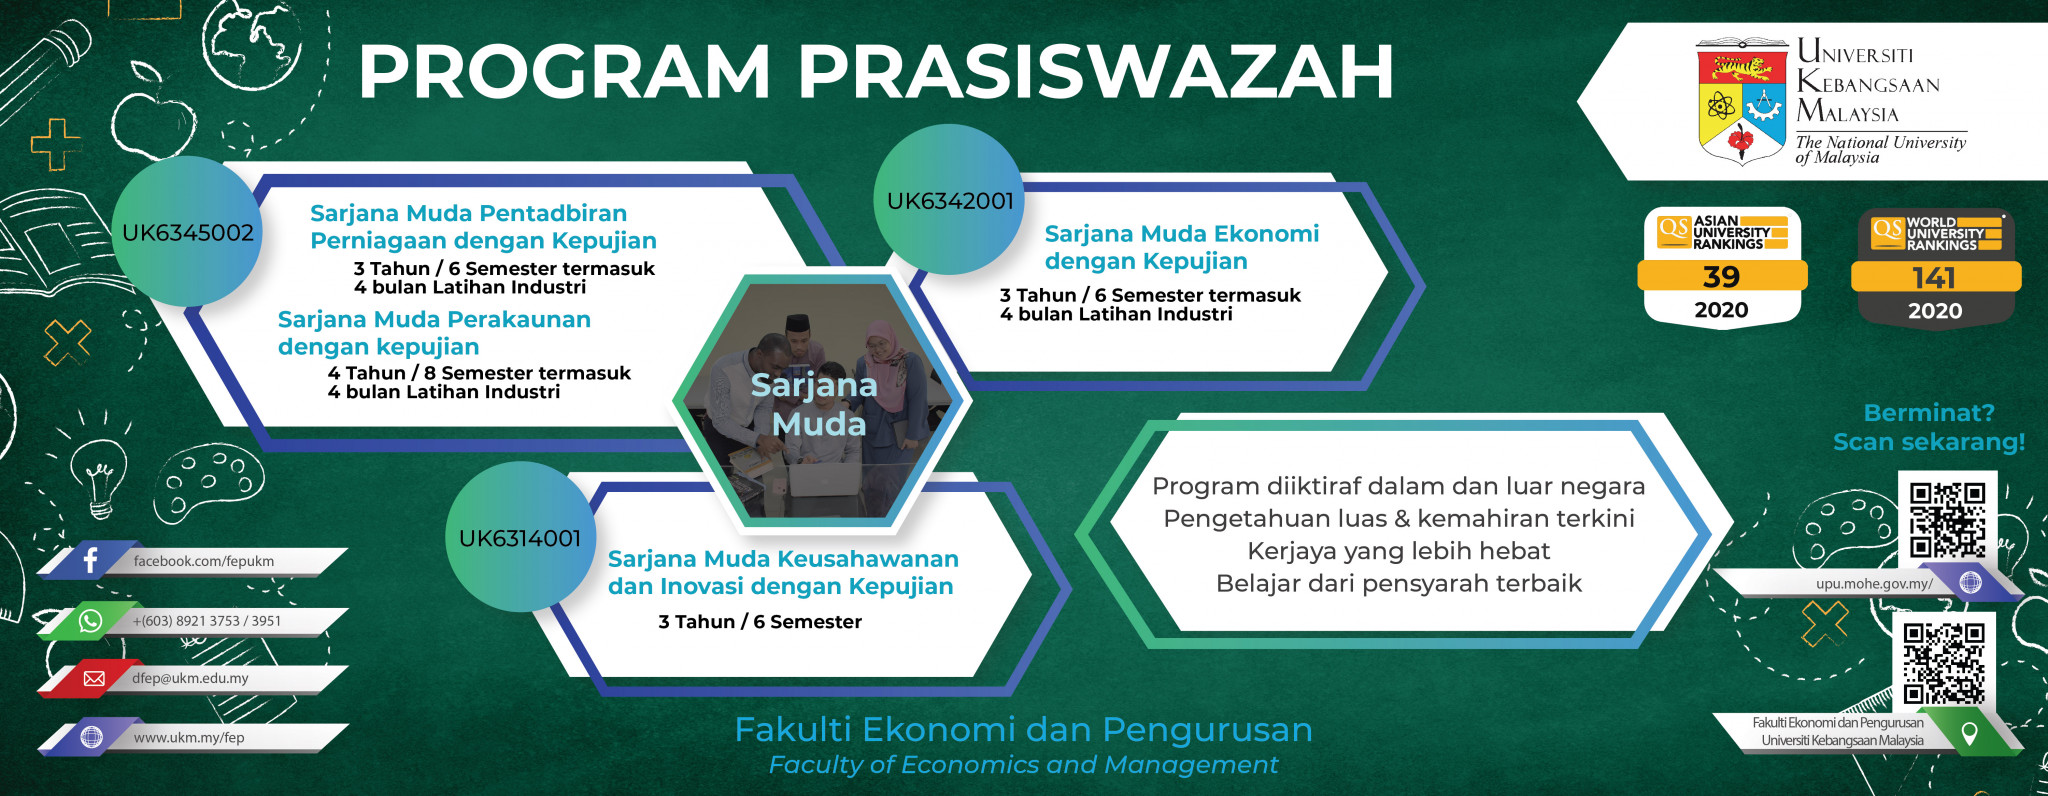 Program Prasiswazah